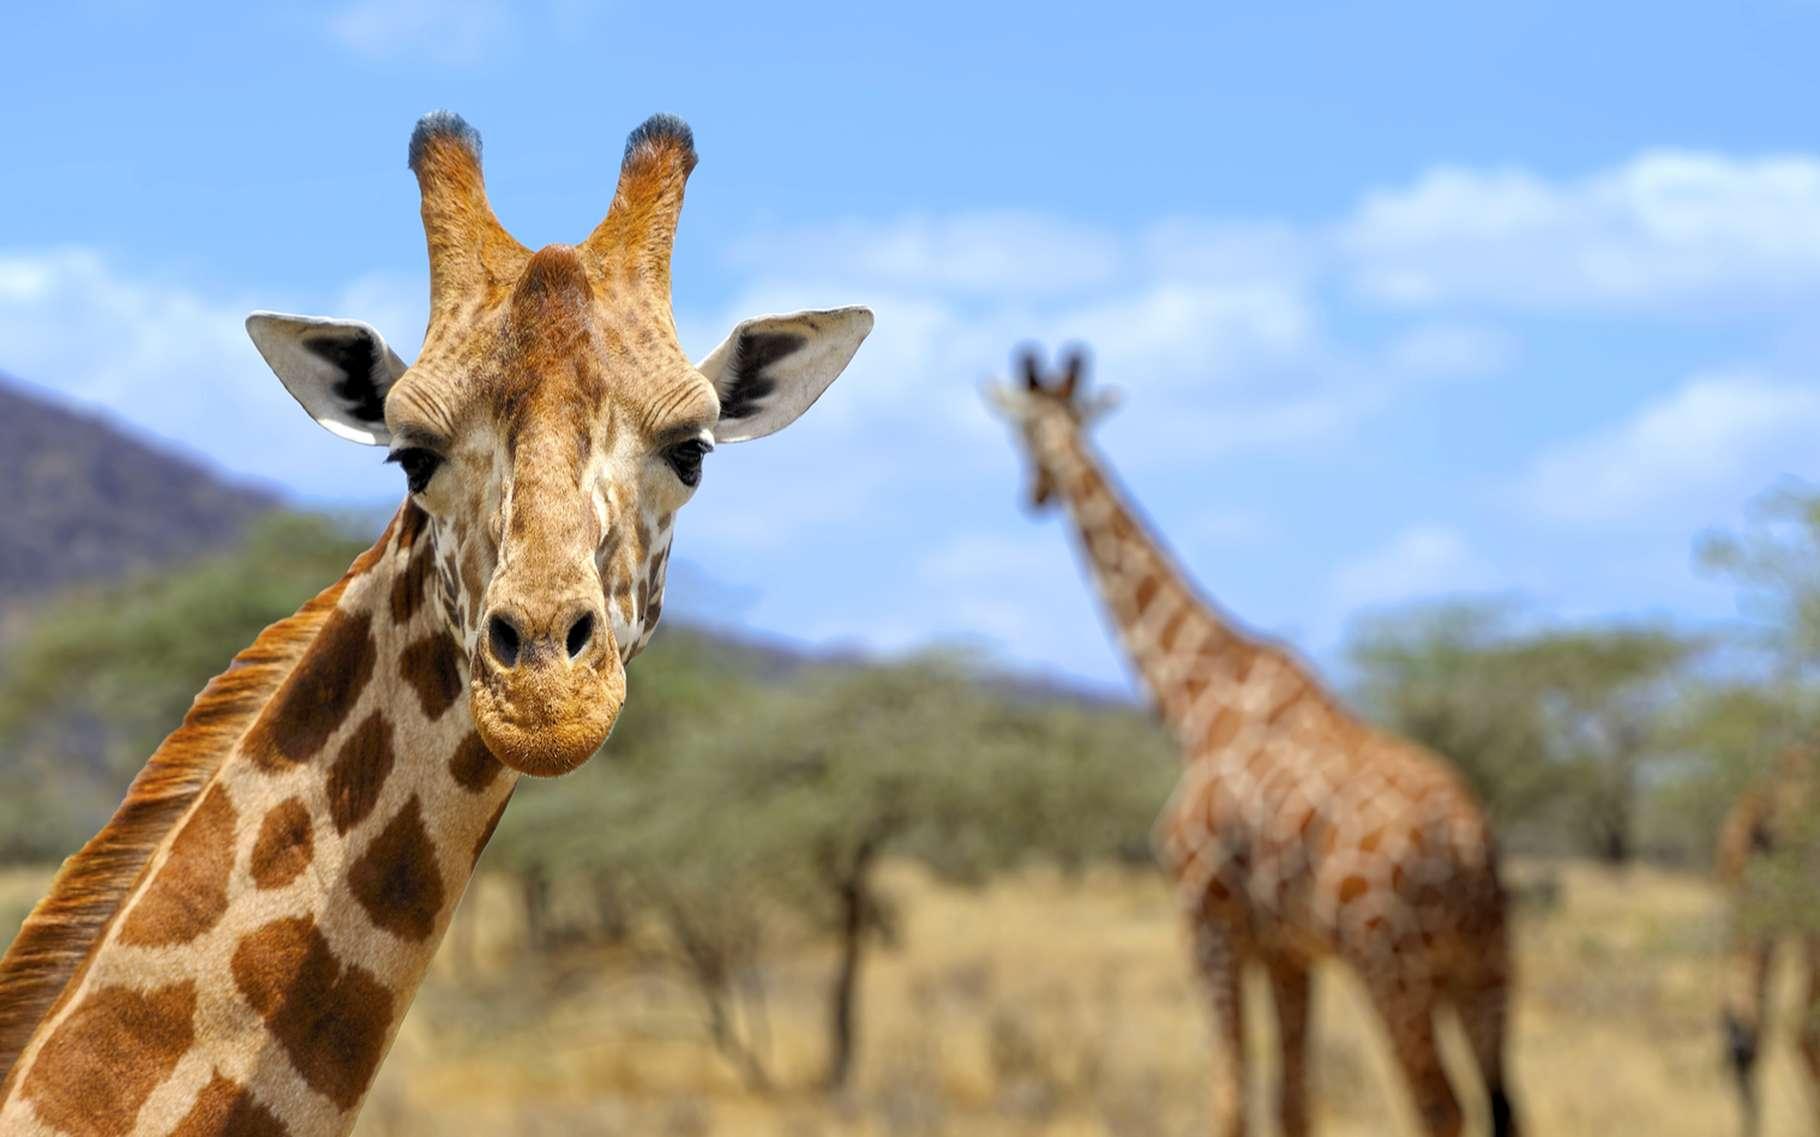 Girafes (Giraffa camelopardalis) dans le parc national d'Amboseli, au Kenya. © Volodymyr Burdiak, Shutterstock